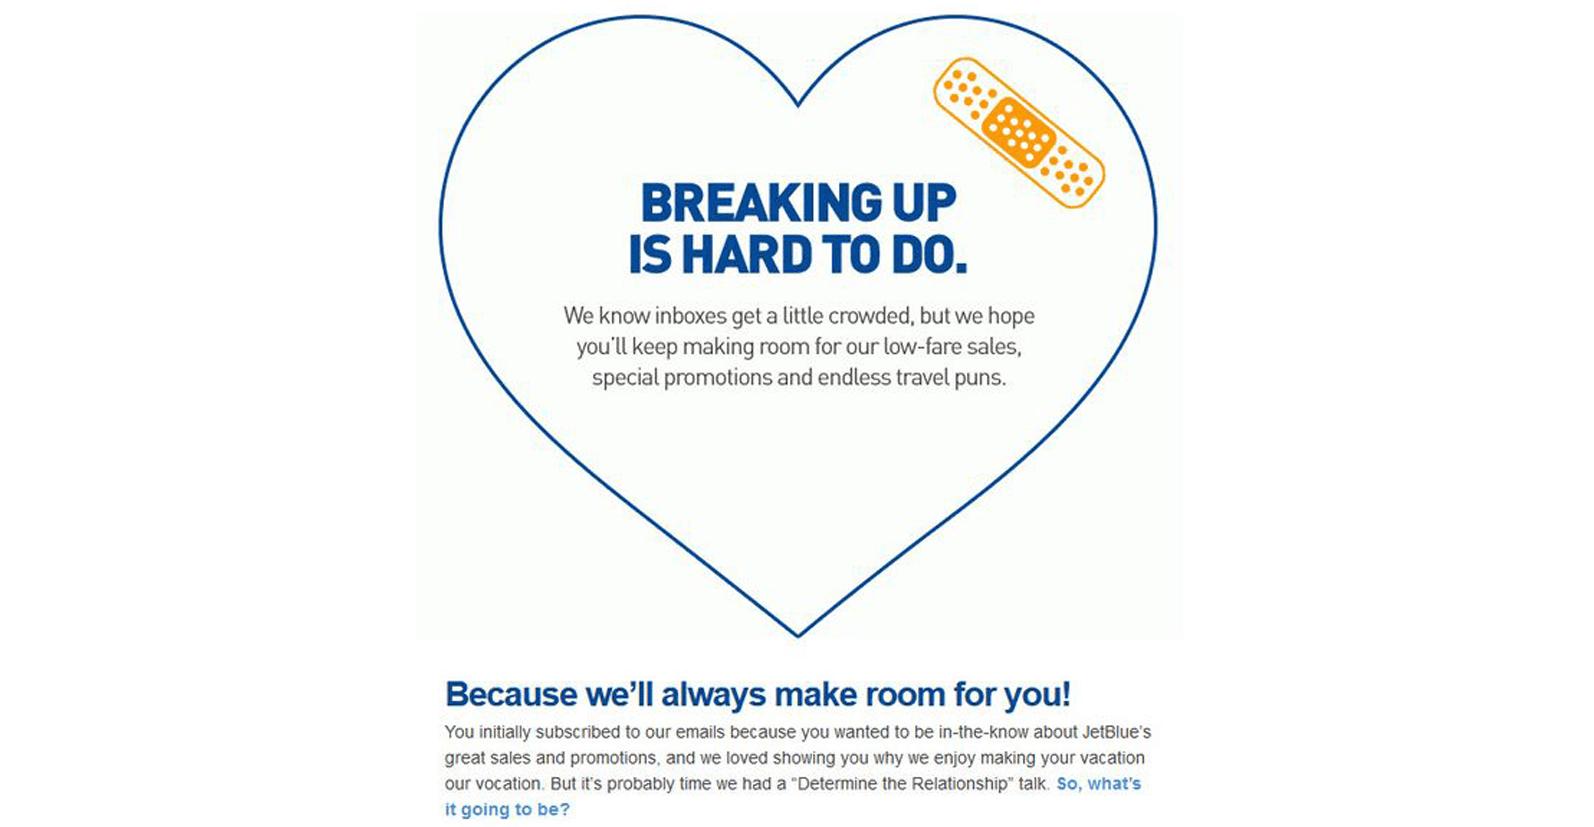 JetBlue's reengagement campaign